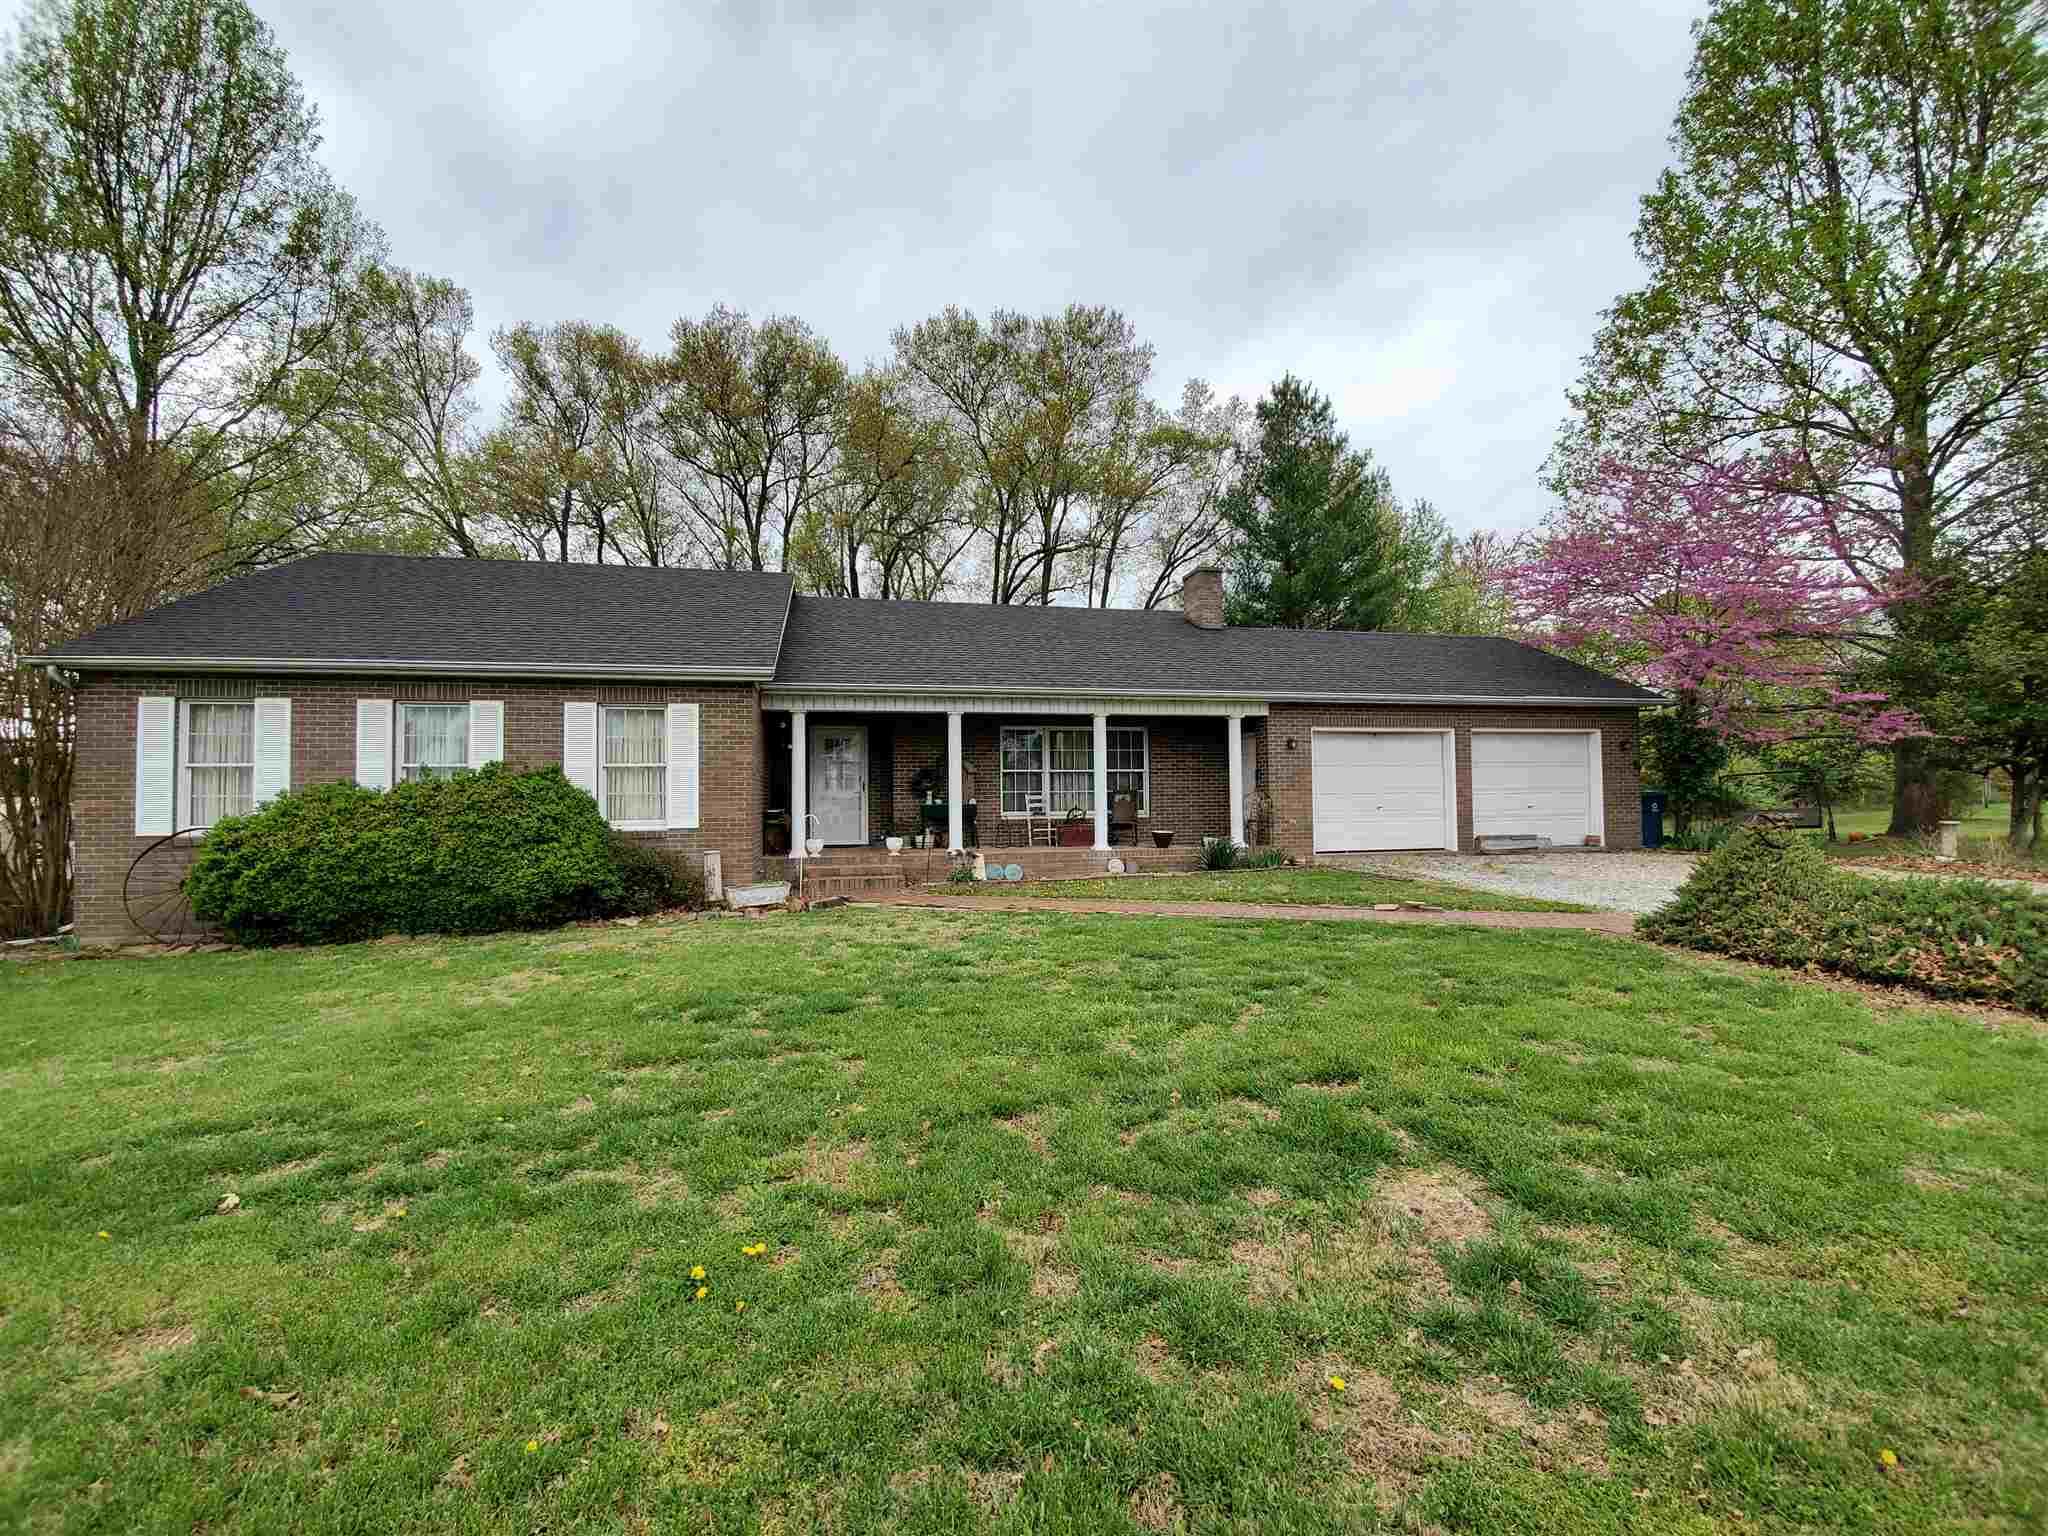 1102 ALAN Property Photo - McLeansboro, IL real estate listing